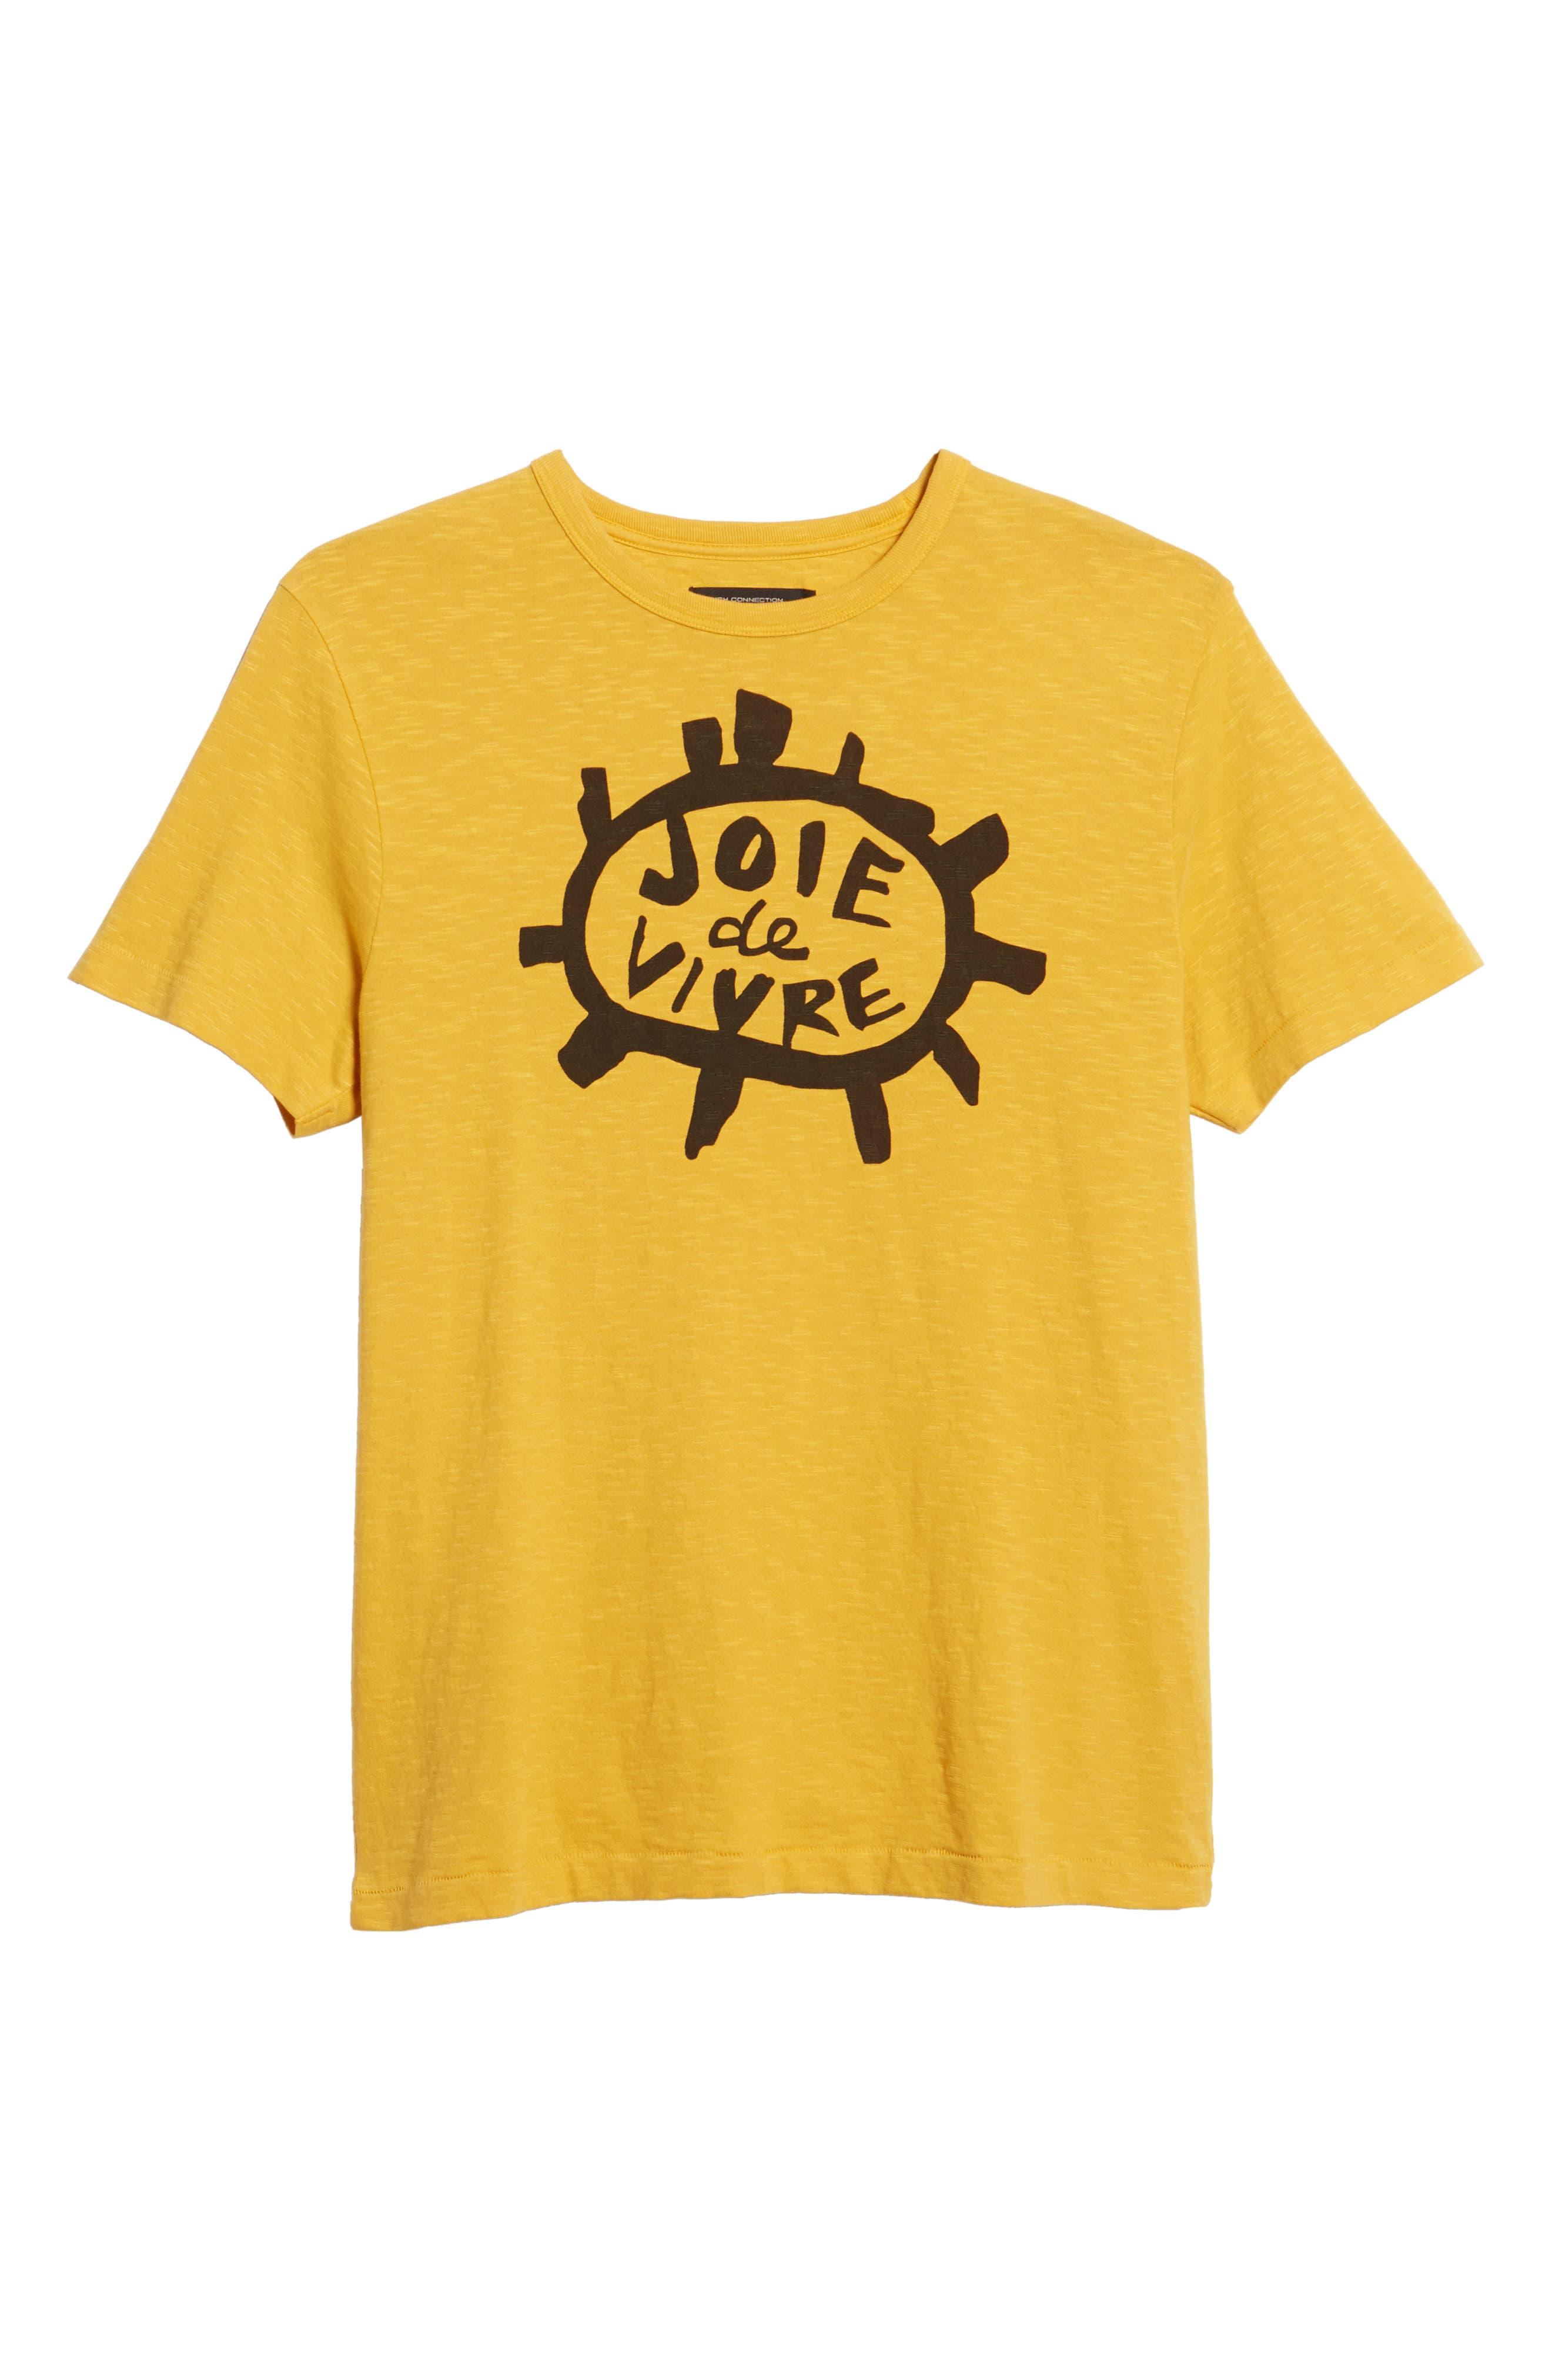 Joy of Living Slubbed T-Shirt,                             Alternate thumbnail 6, color,                             CALLUNA YELLOW BLACK